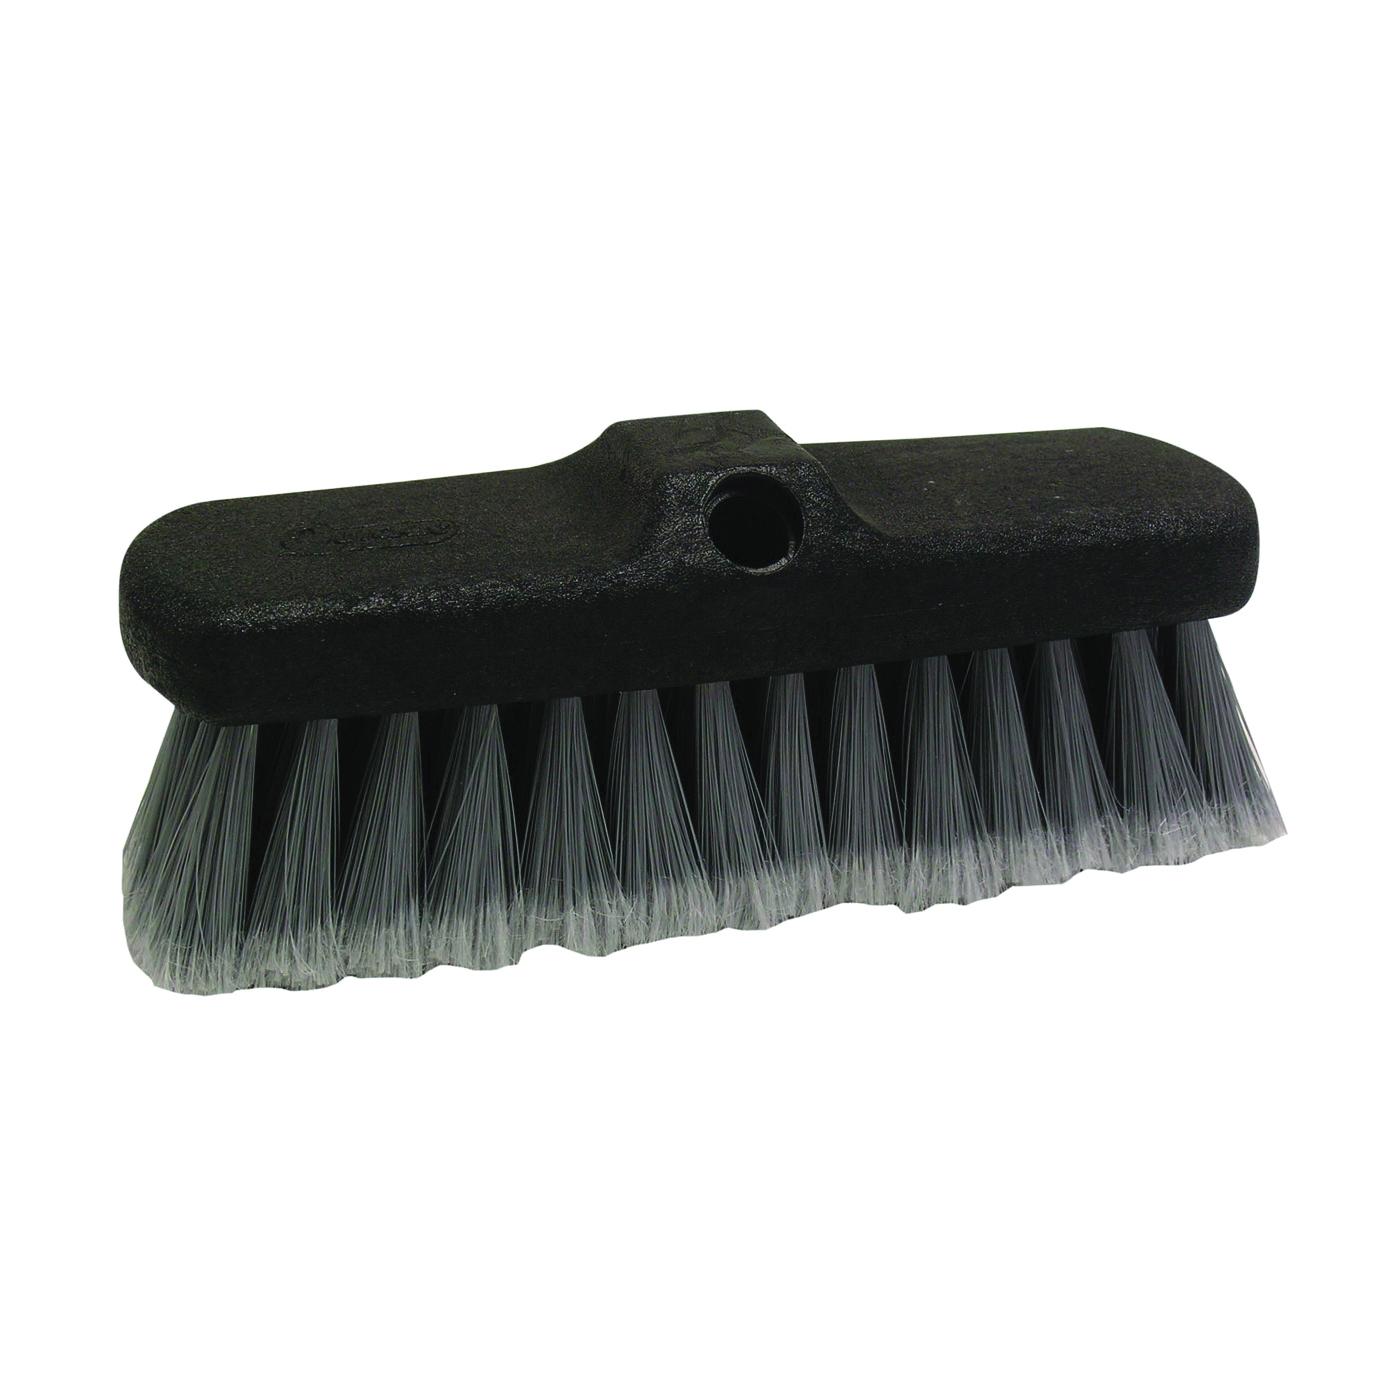 Picture of Quickie 235CNRM-12 Siding Scrub Brush, 2-1/2 in L Trim, Black Handle